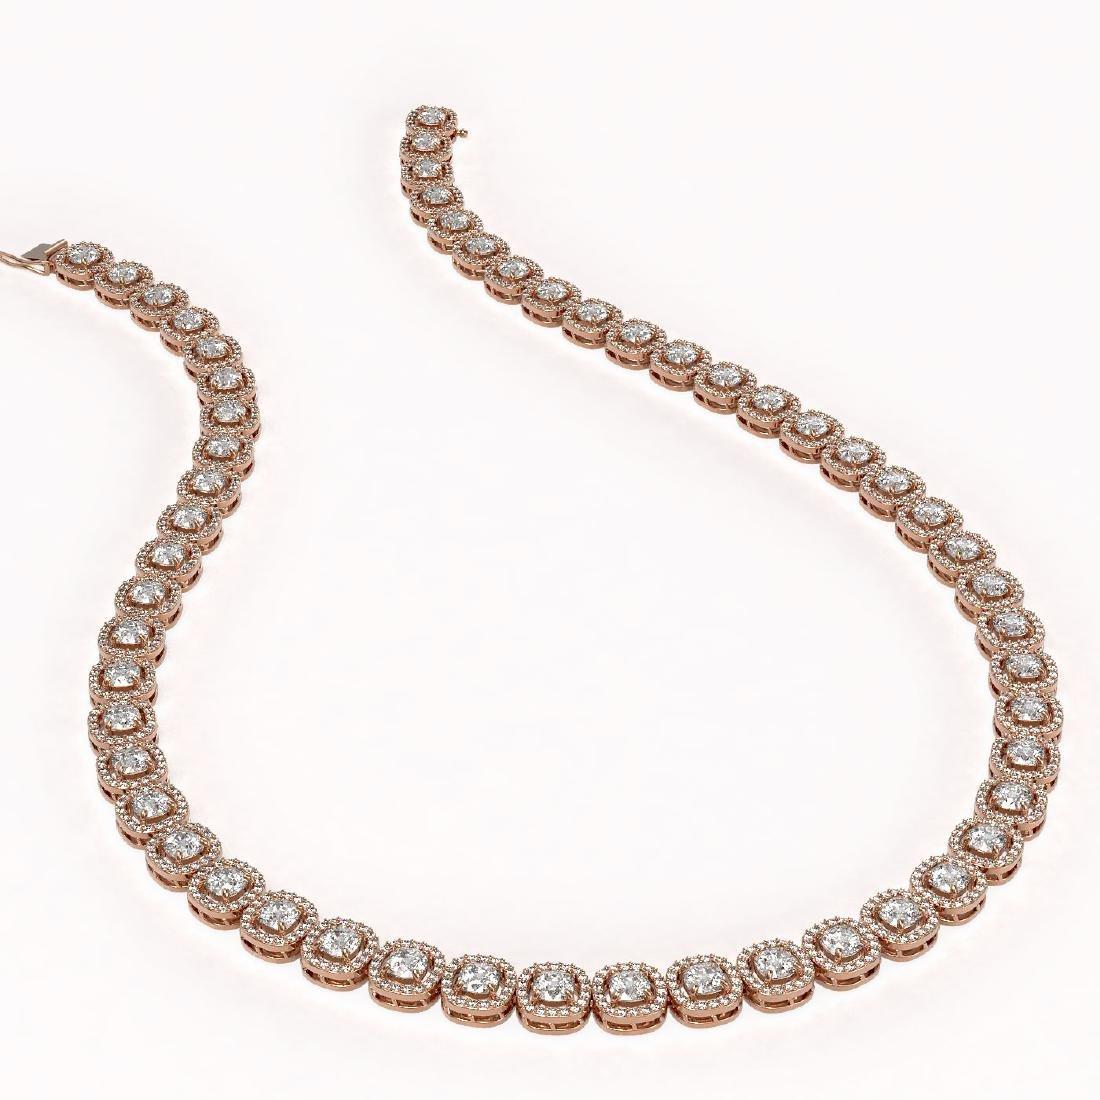 24.4 ctw Cushion Diamond Designer Necklace 18K Rose - 2